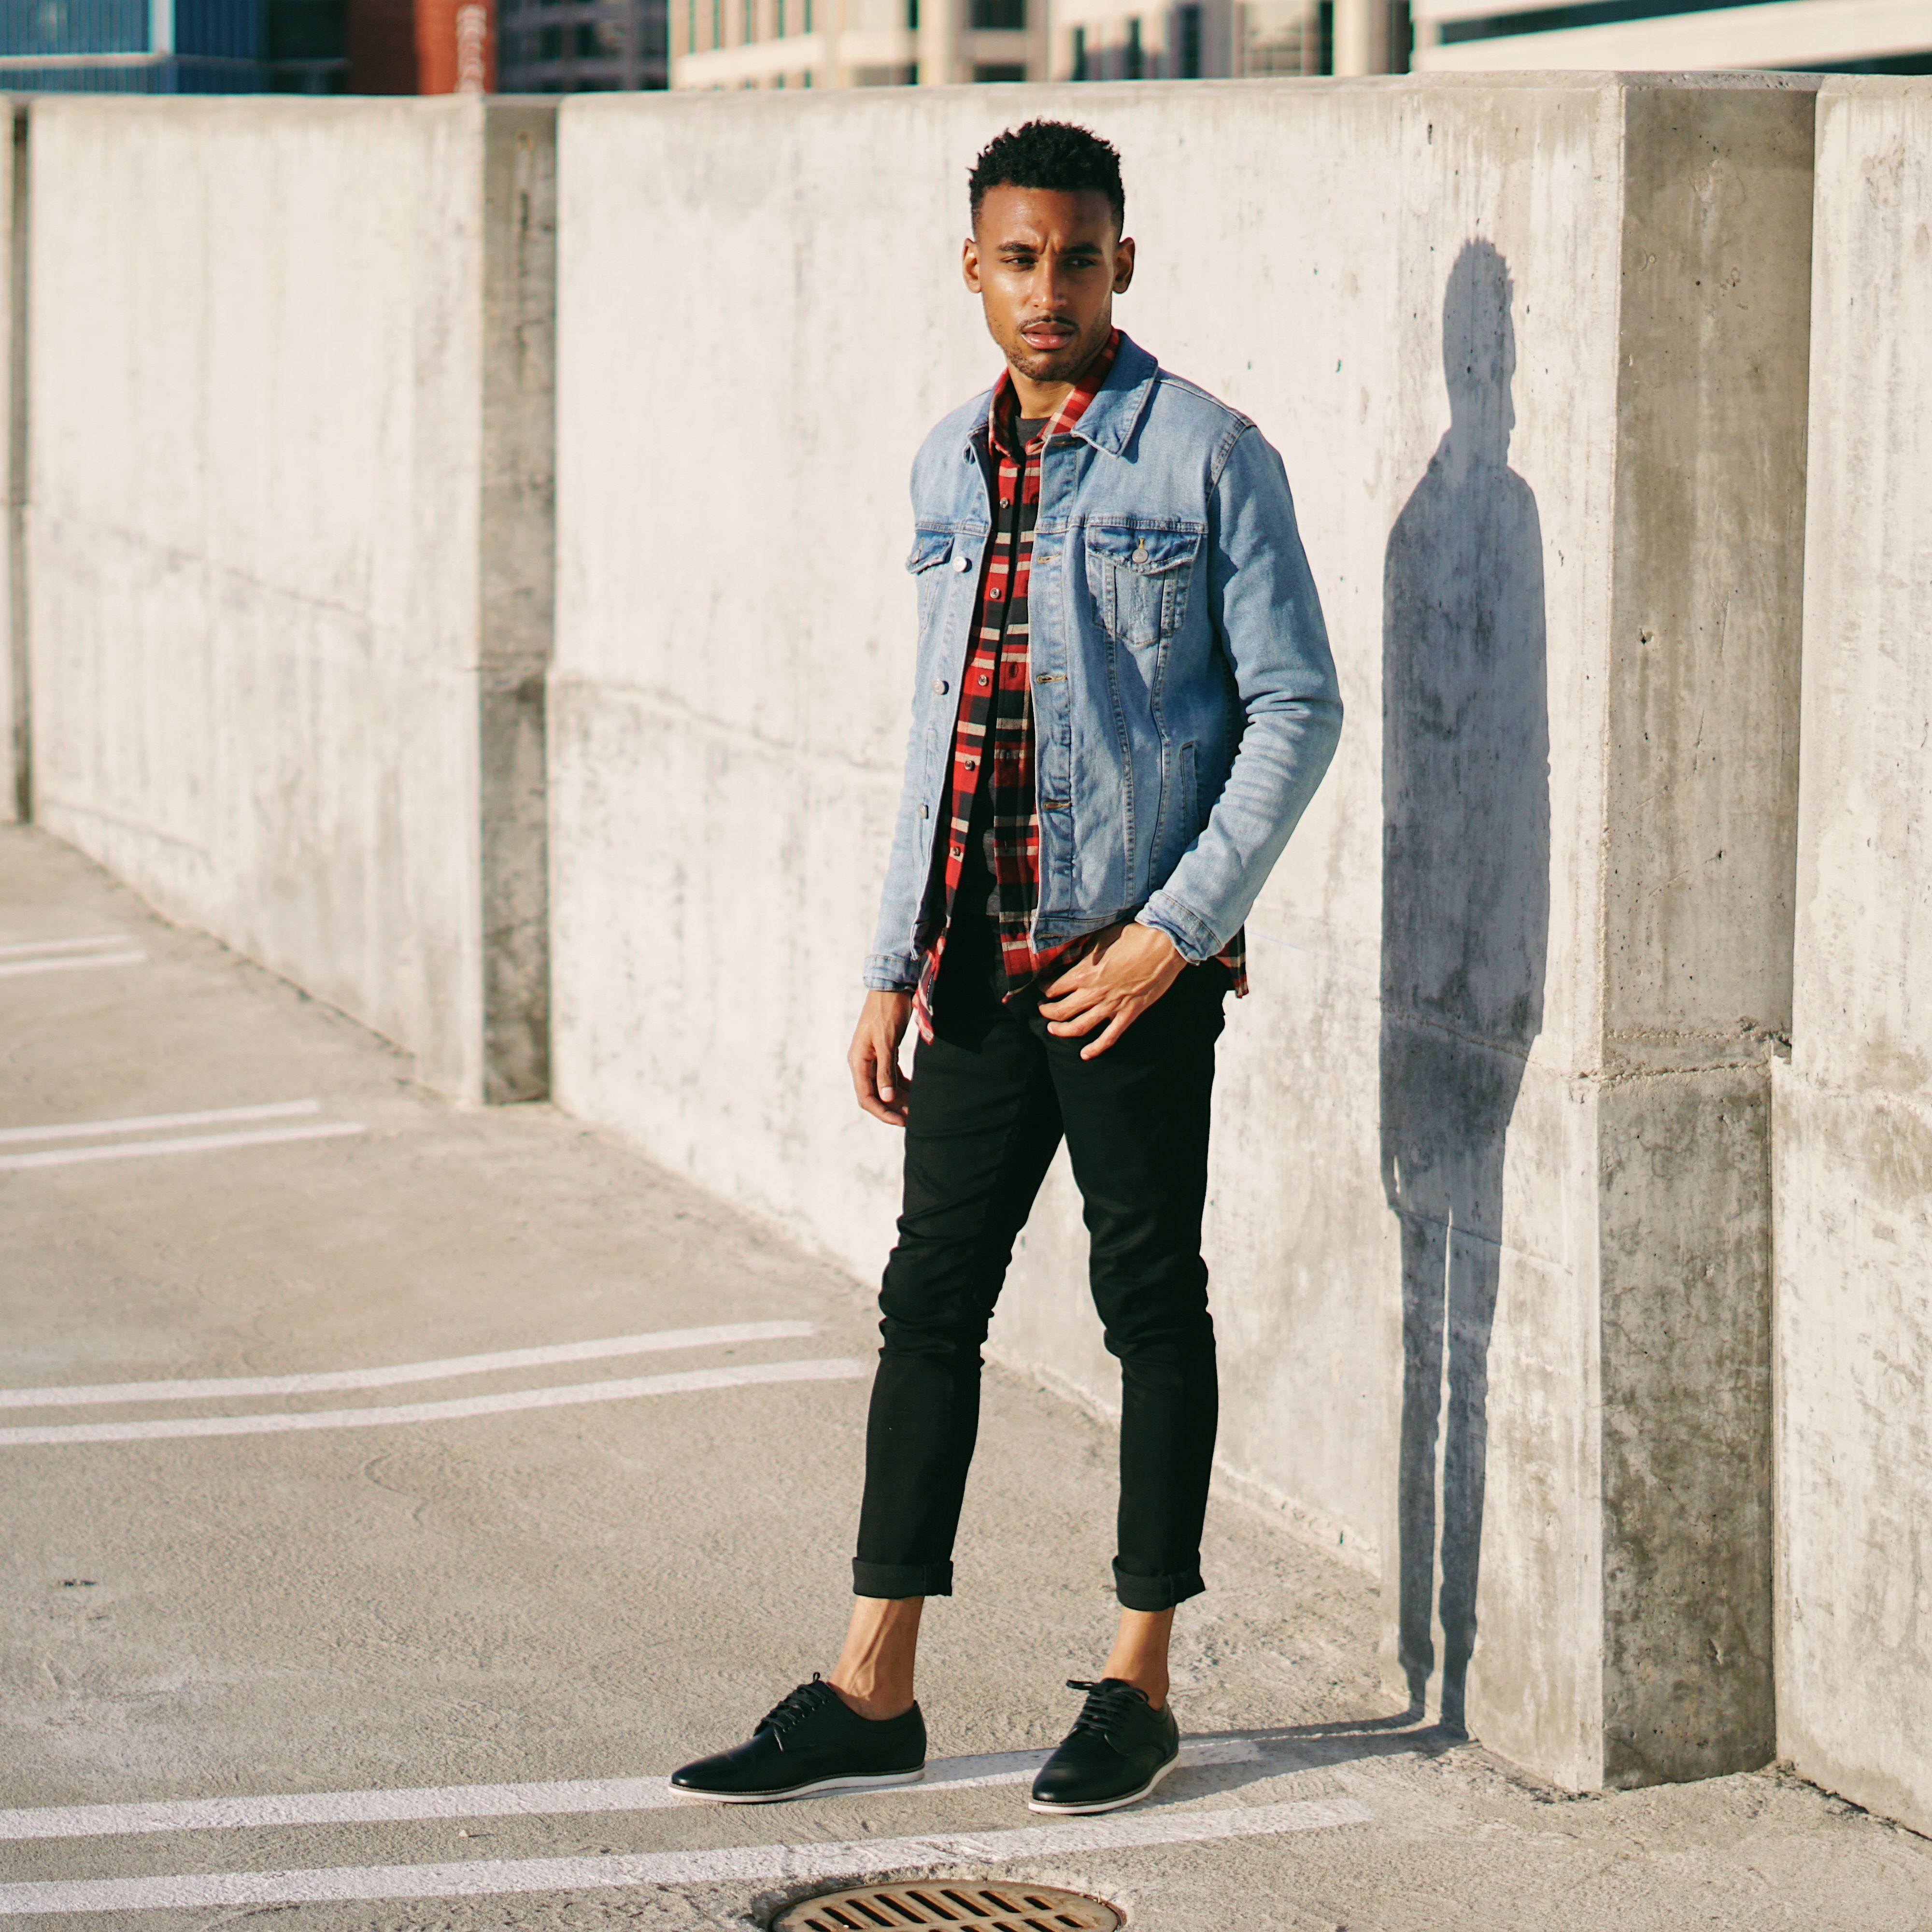 ede6bc63fb62 Denim Jacket Outfit Idea Mens Fashion   Style Streetstyle ASOS